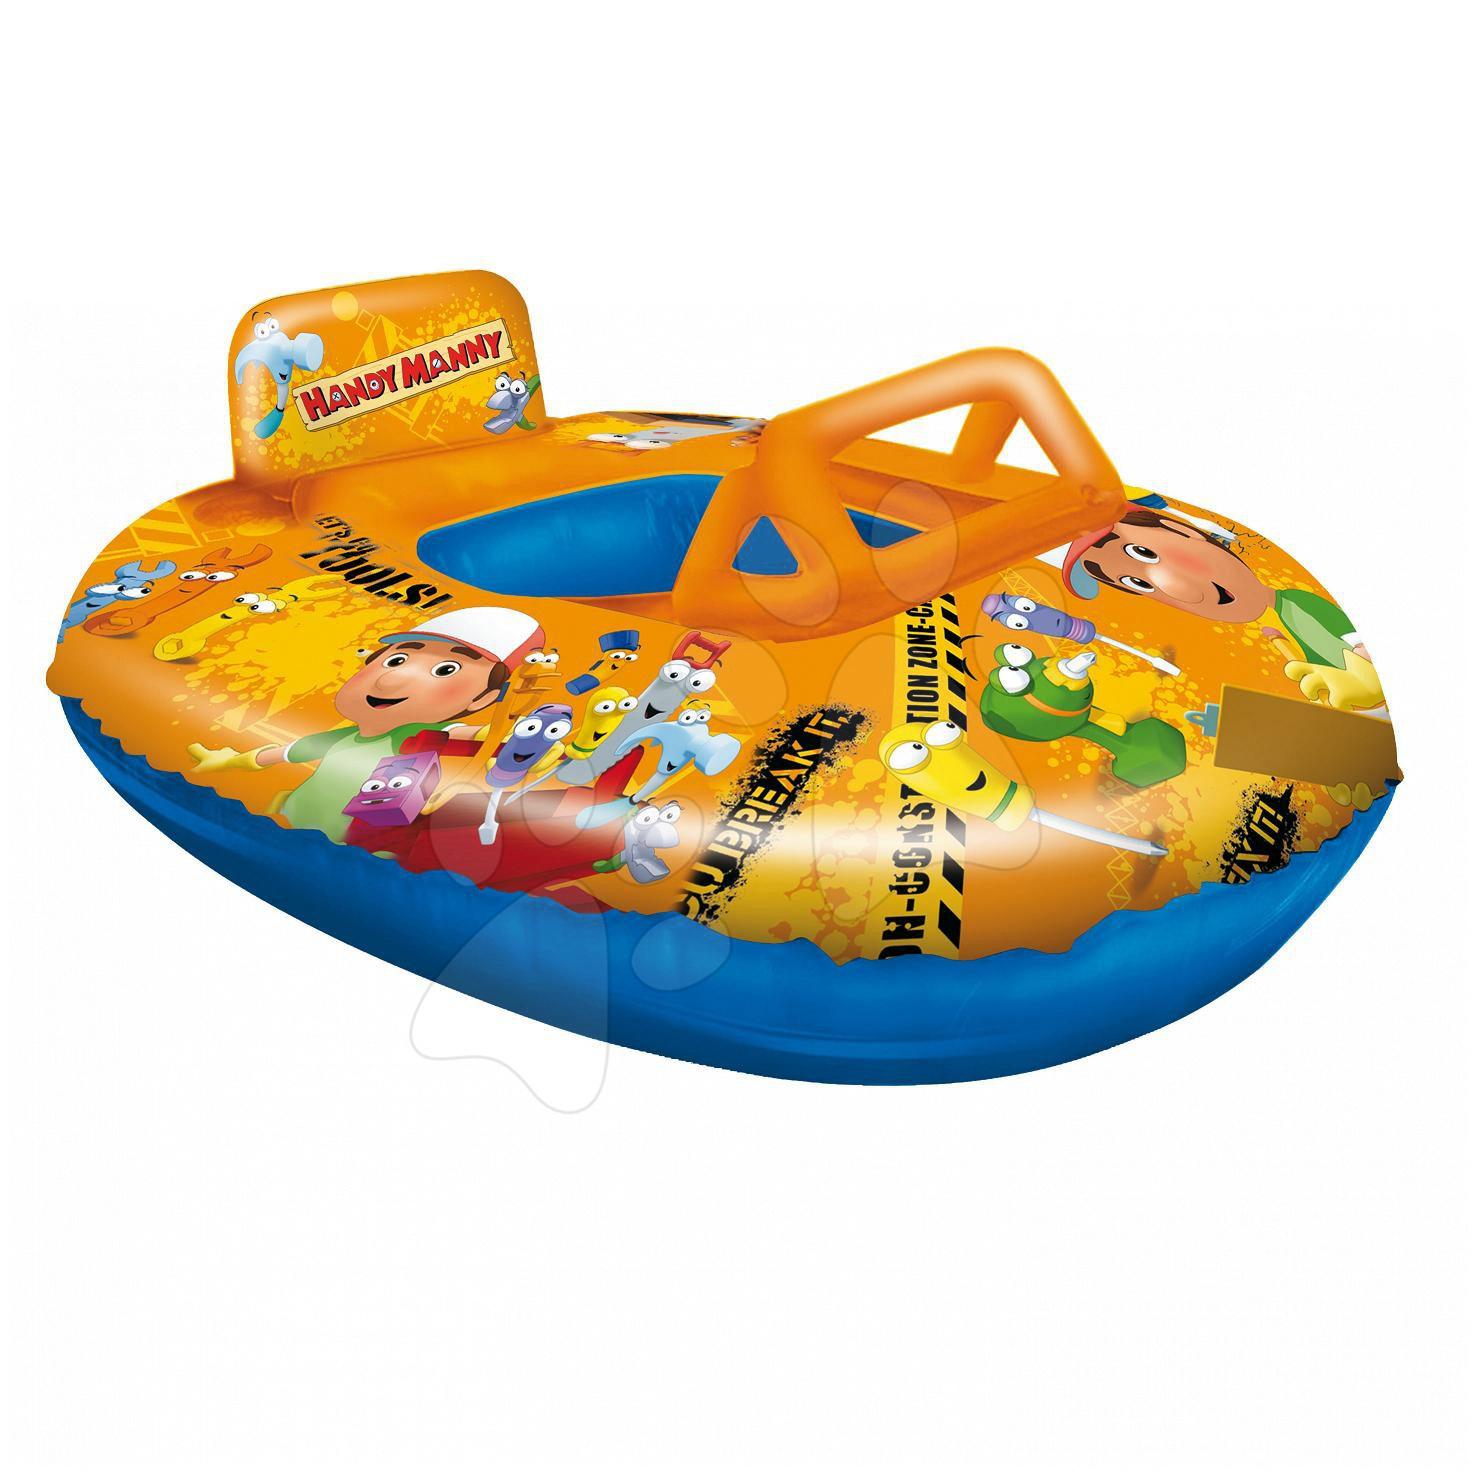 Barcă gonflabilă Handy Manny Mondo 90 cm